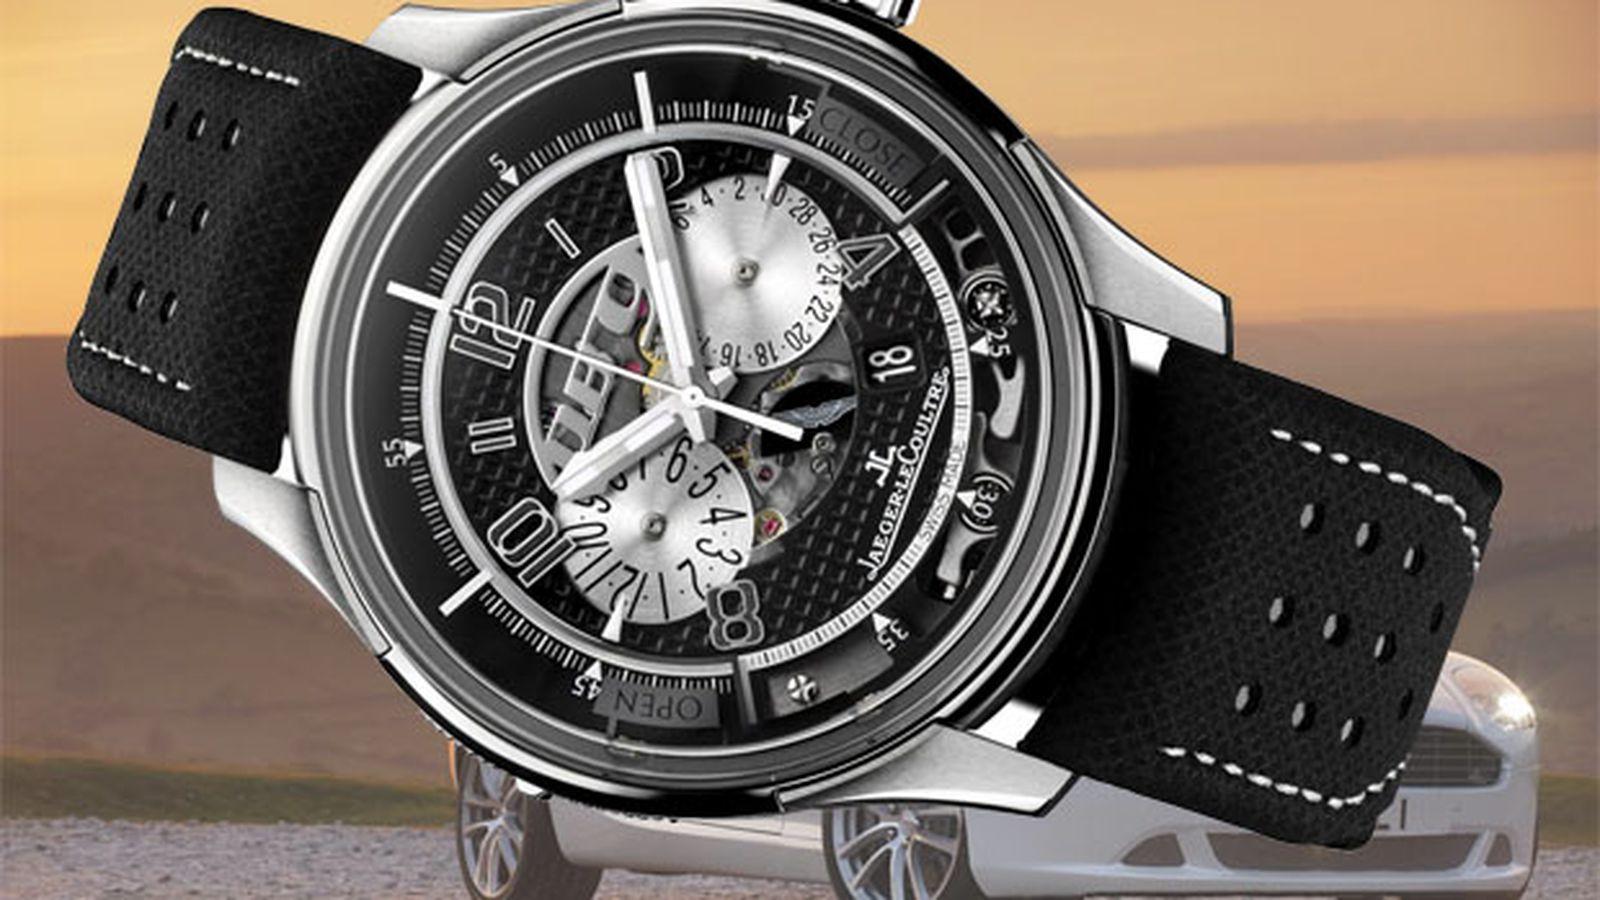 Aston martin AMV OX2 watch